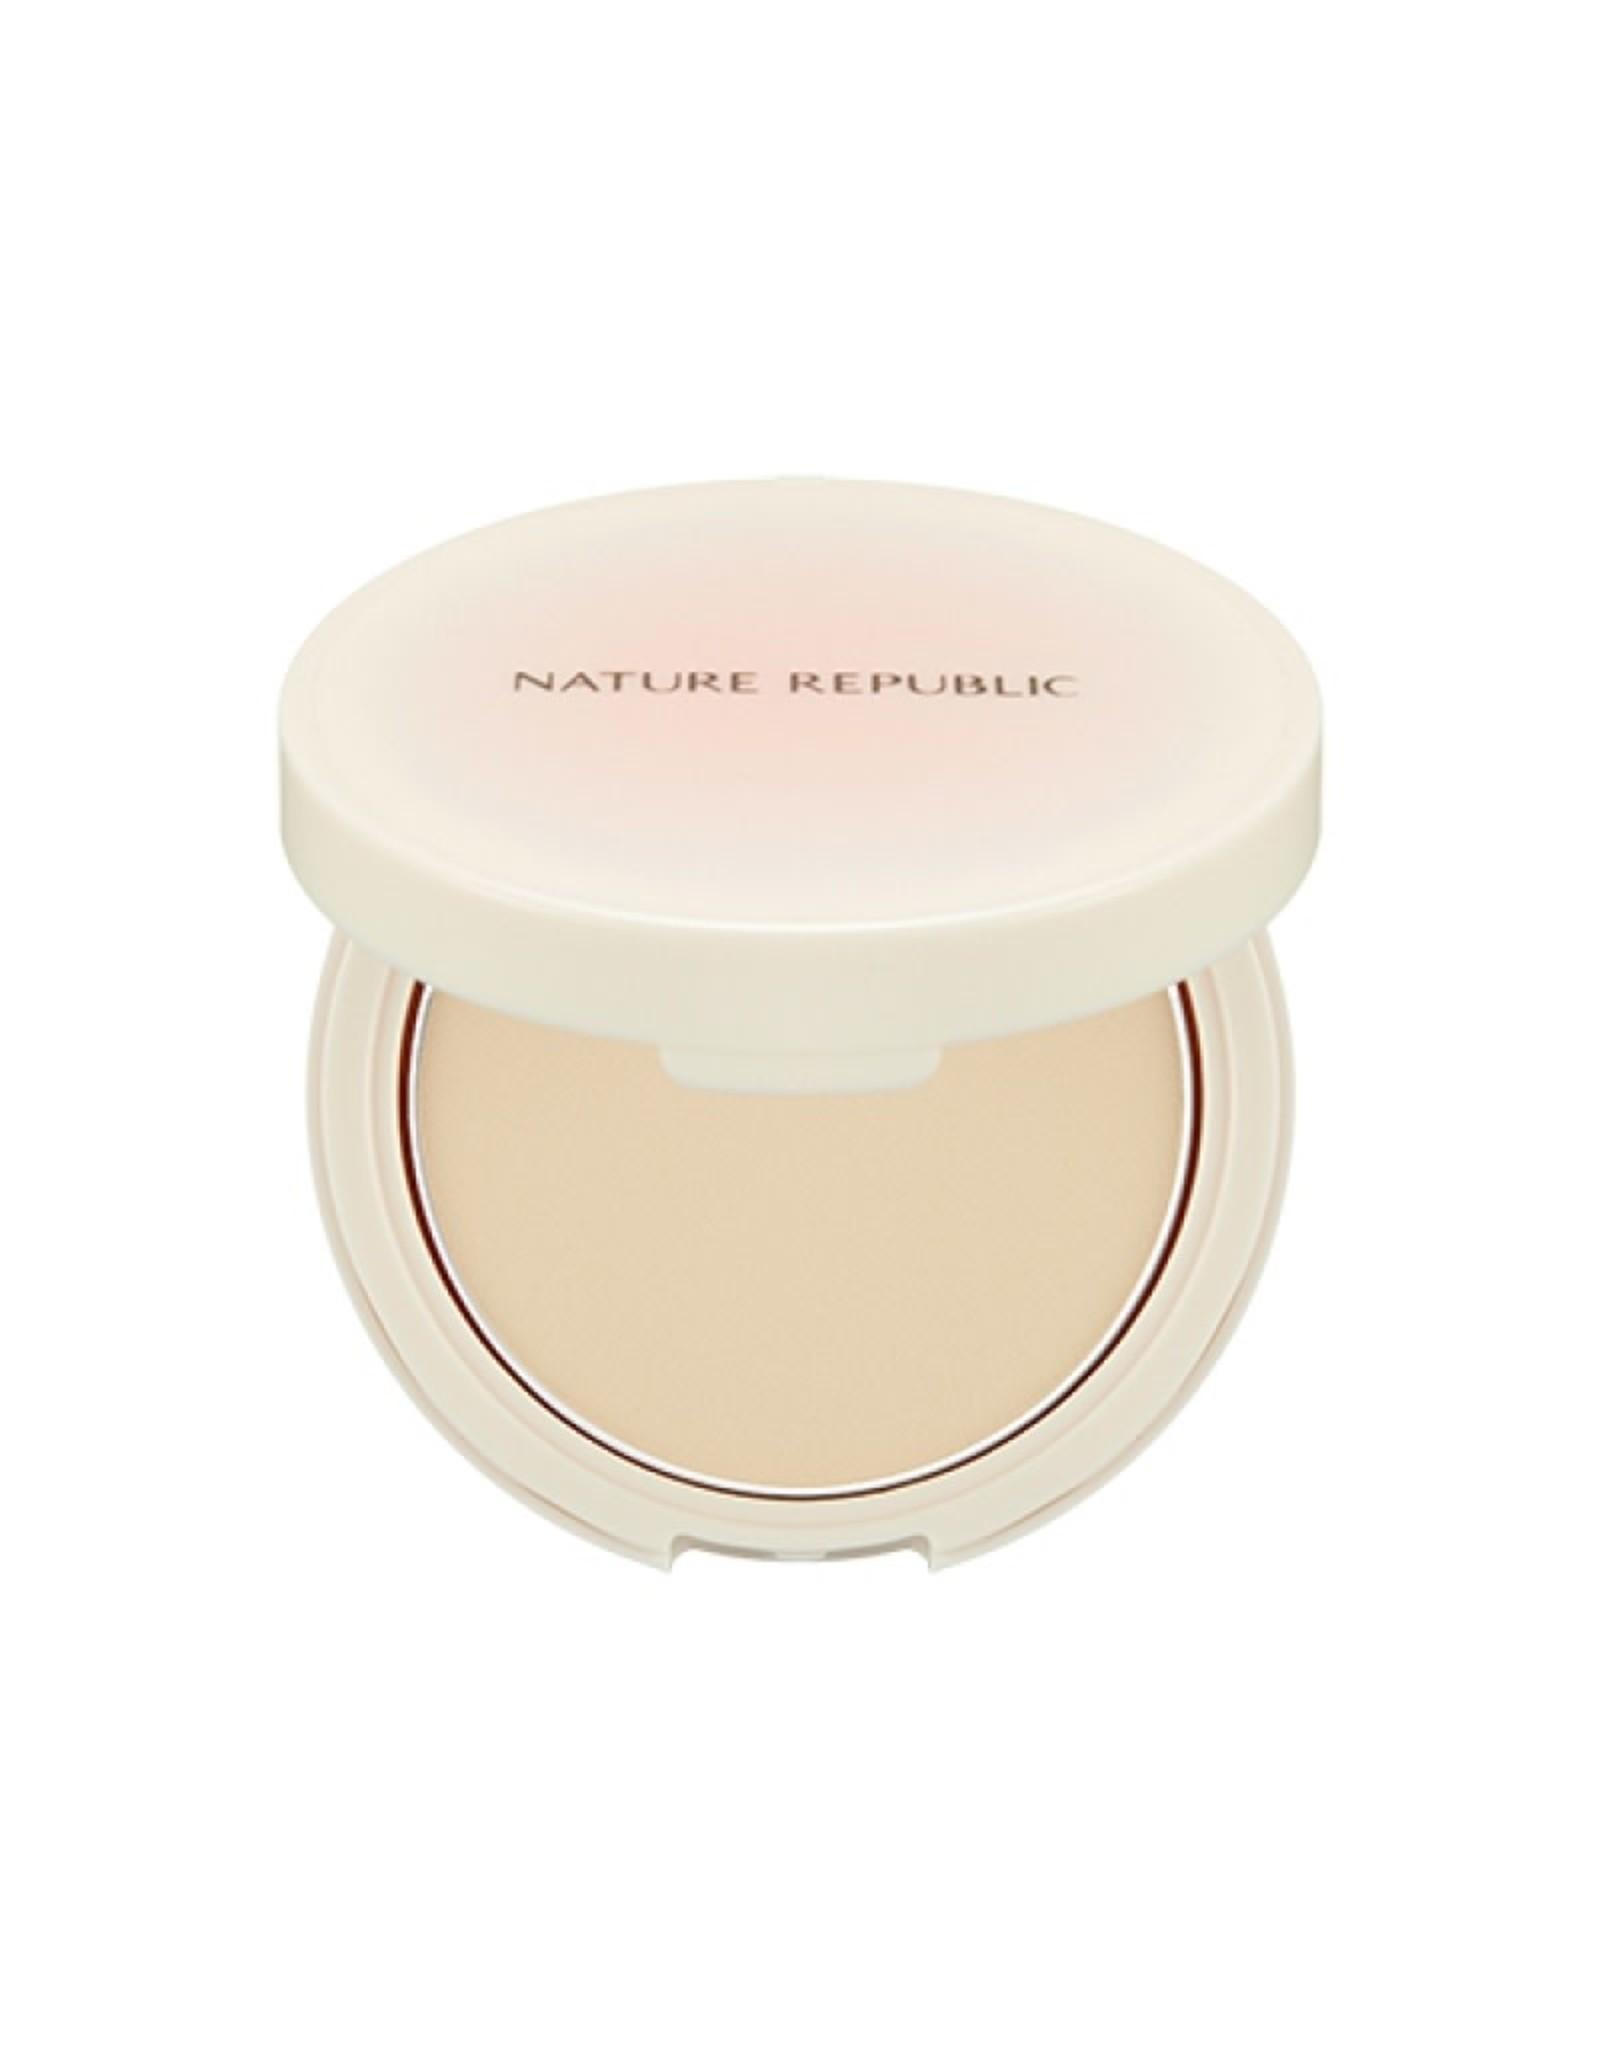 Pure Shine Powder Pact 21 Nude Beige